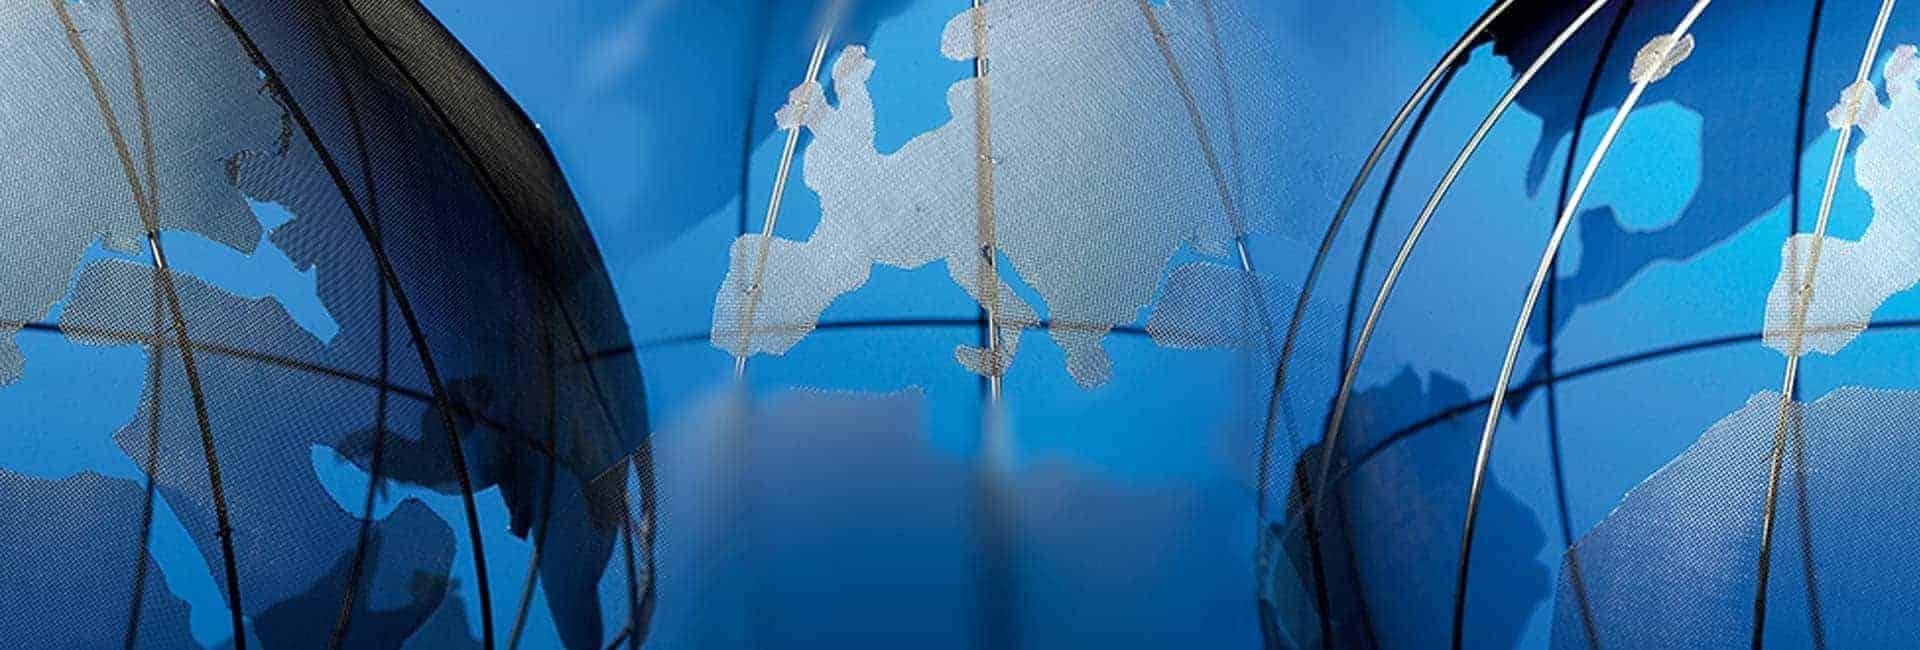 Copper wire mesh | SS Wire Mesh | manufacturer | supplier ...